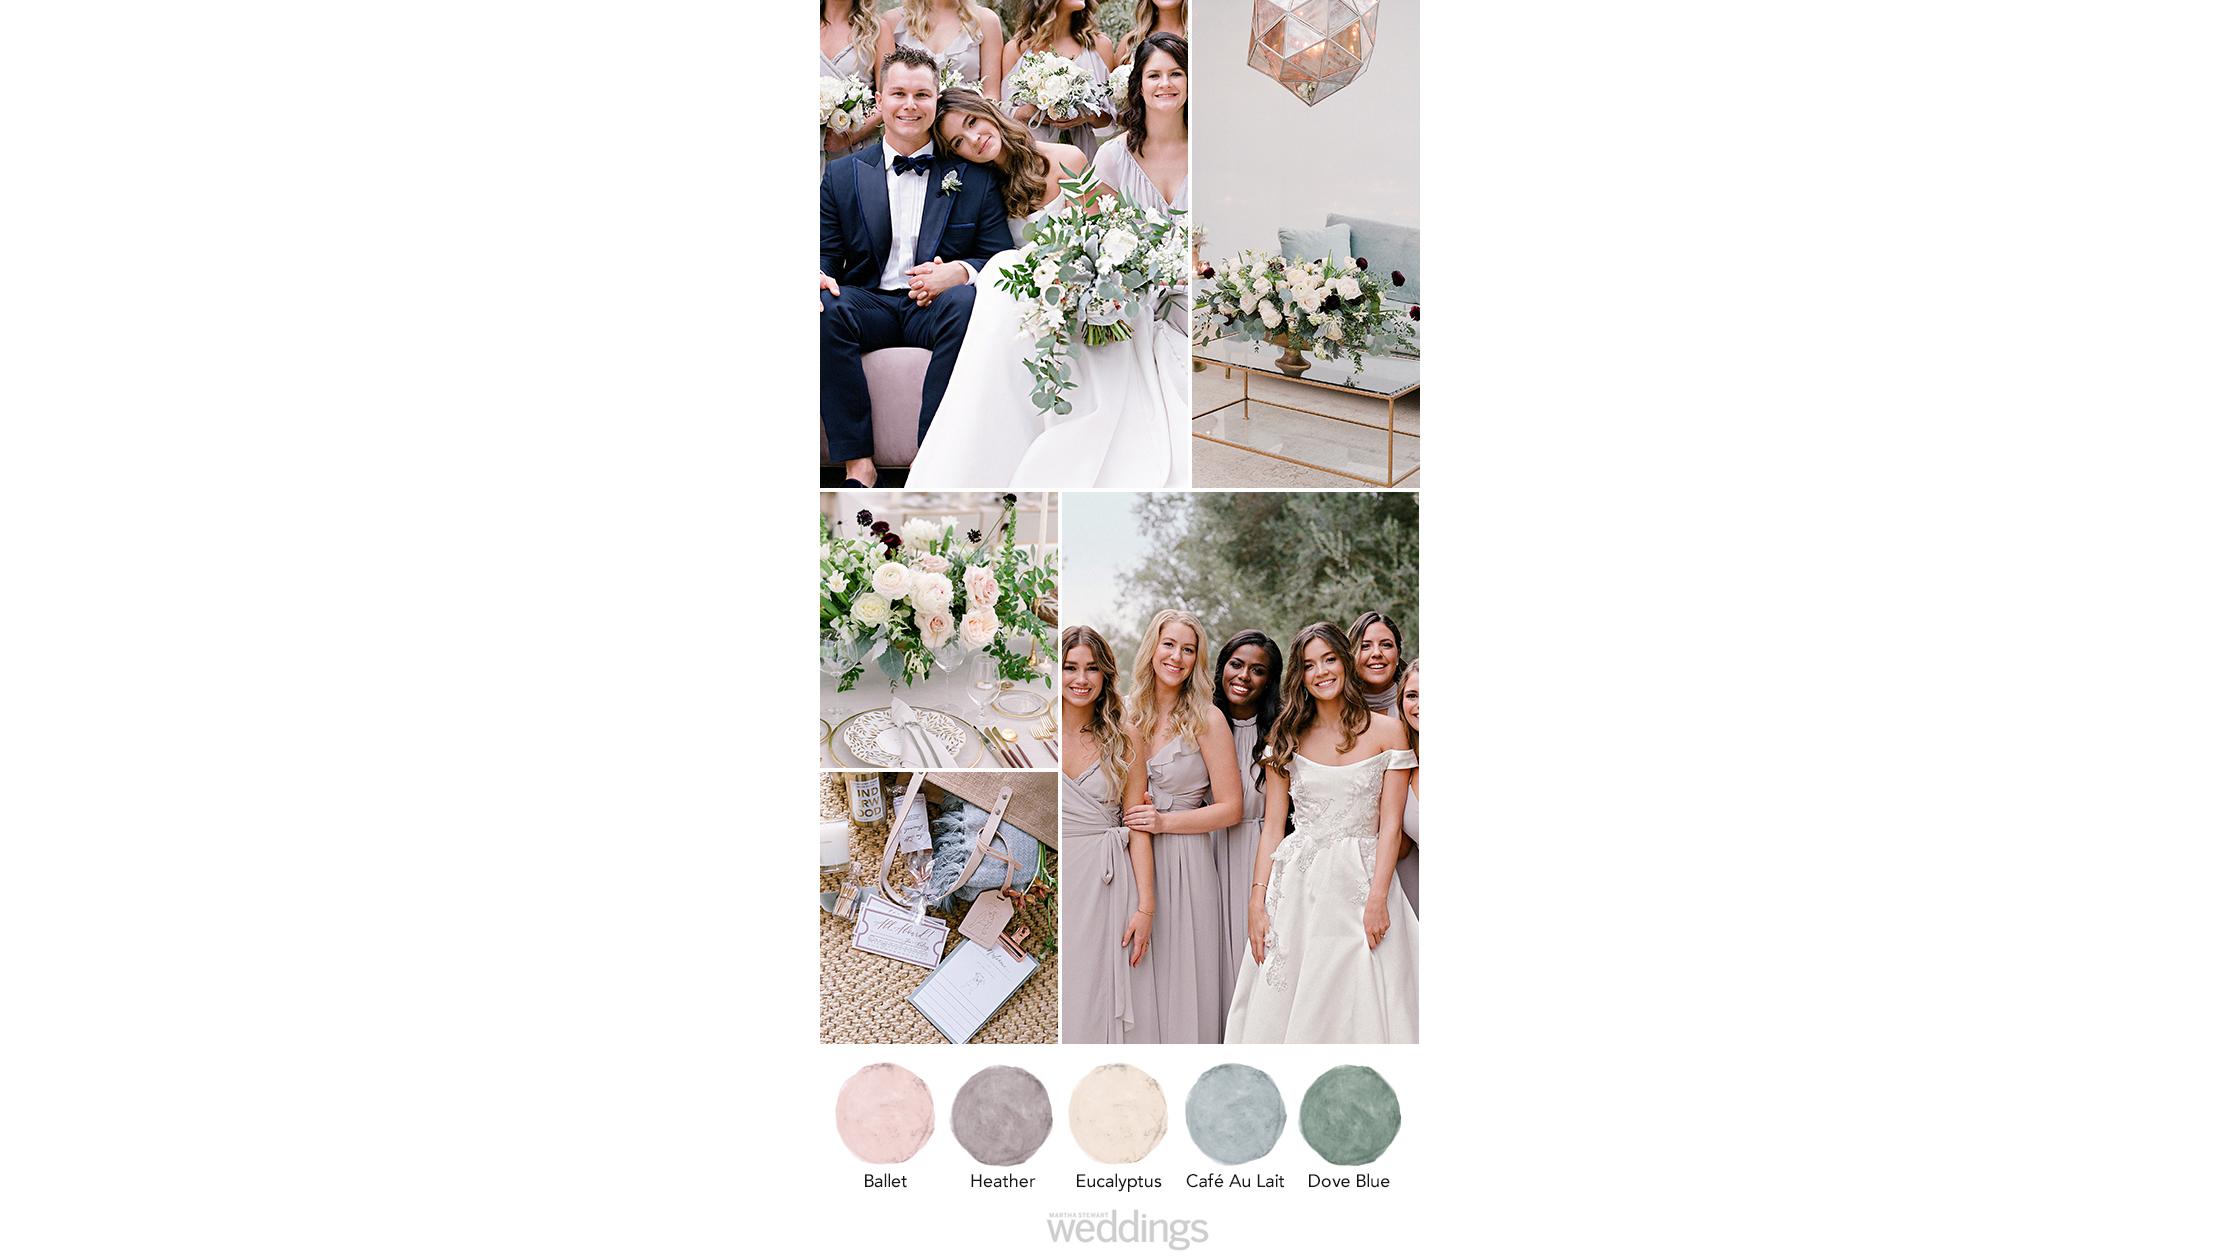 wintery purple wedding color palette ideas